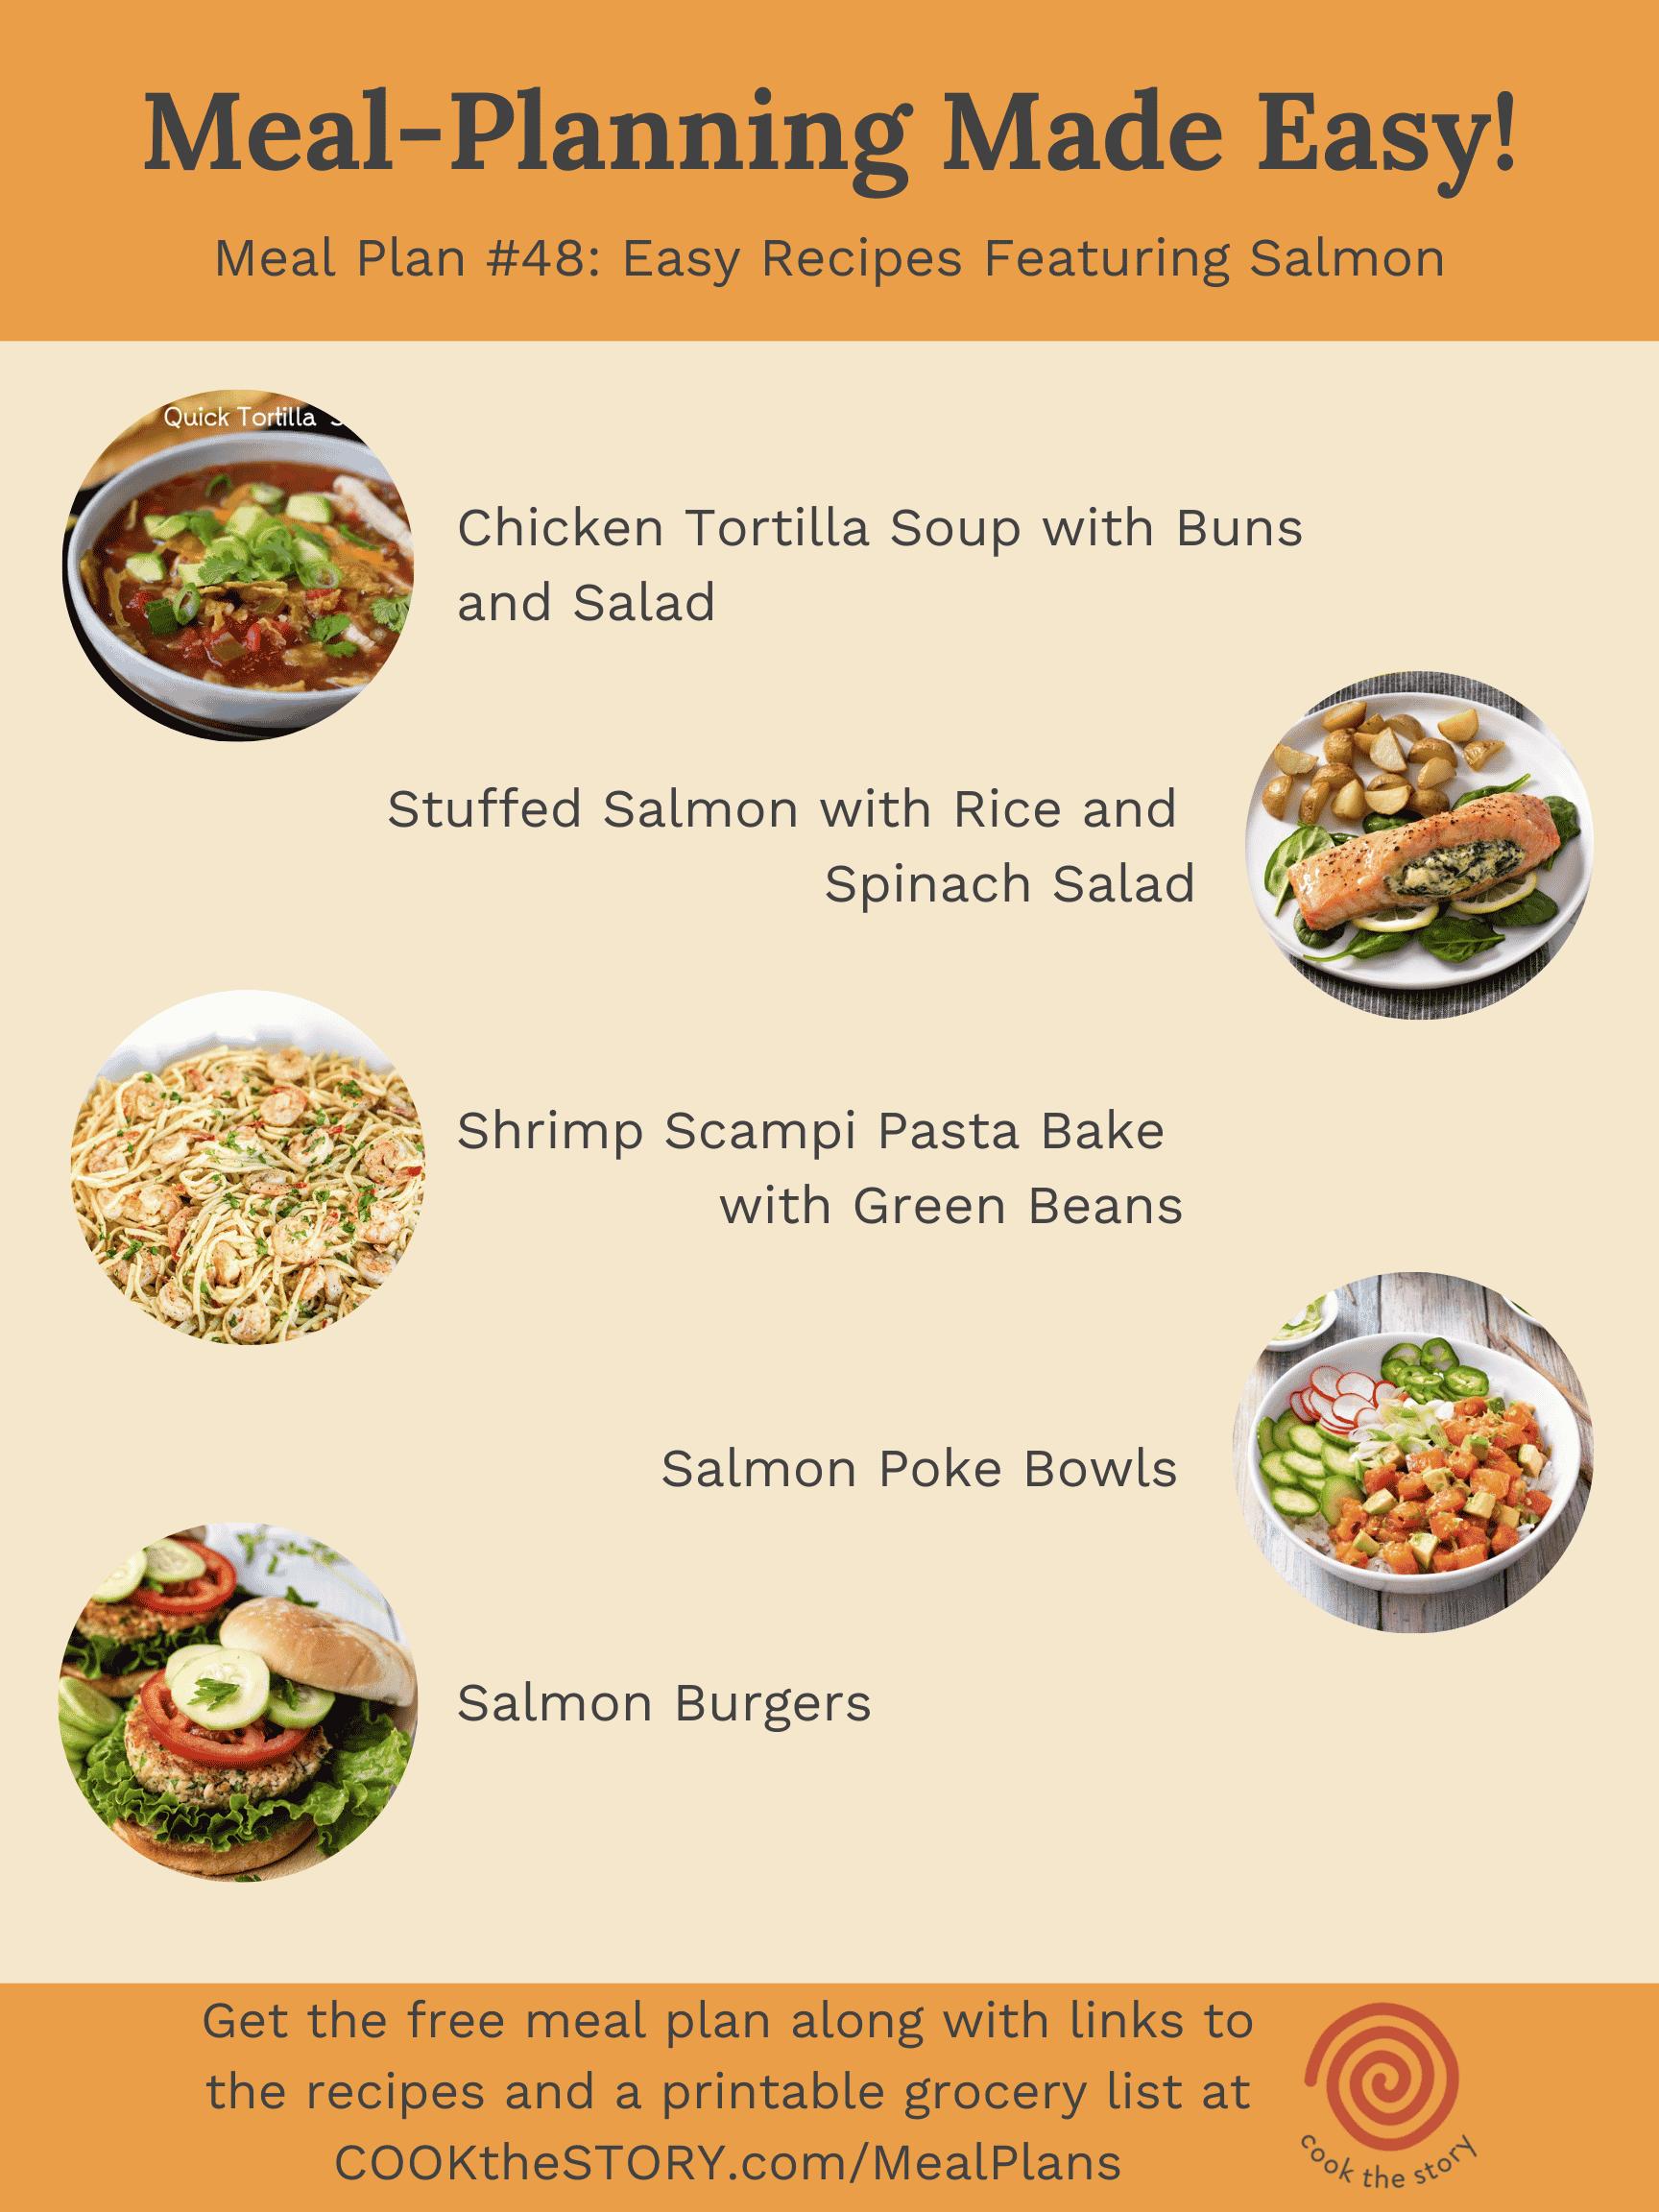 Meal Plan #48: Fresh Takes On Salmon